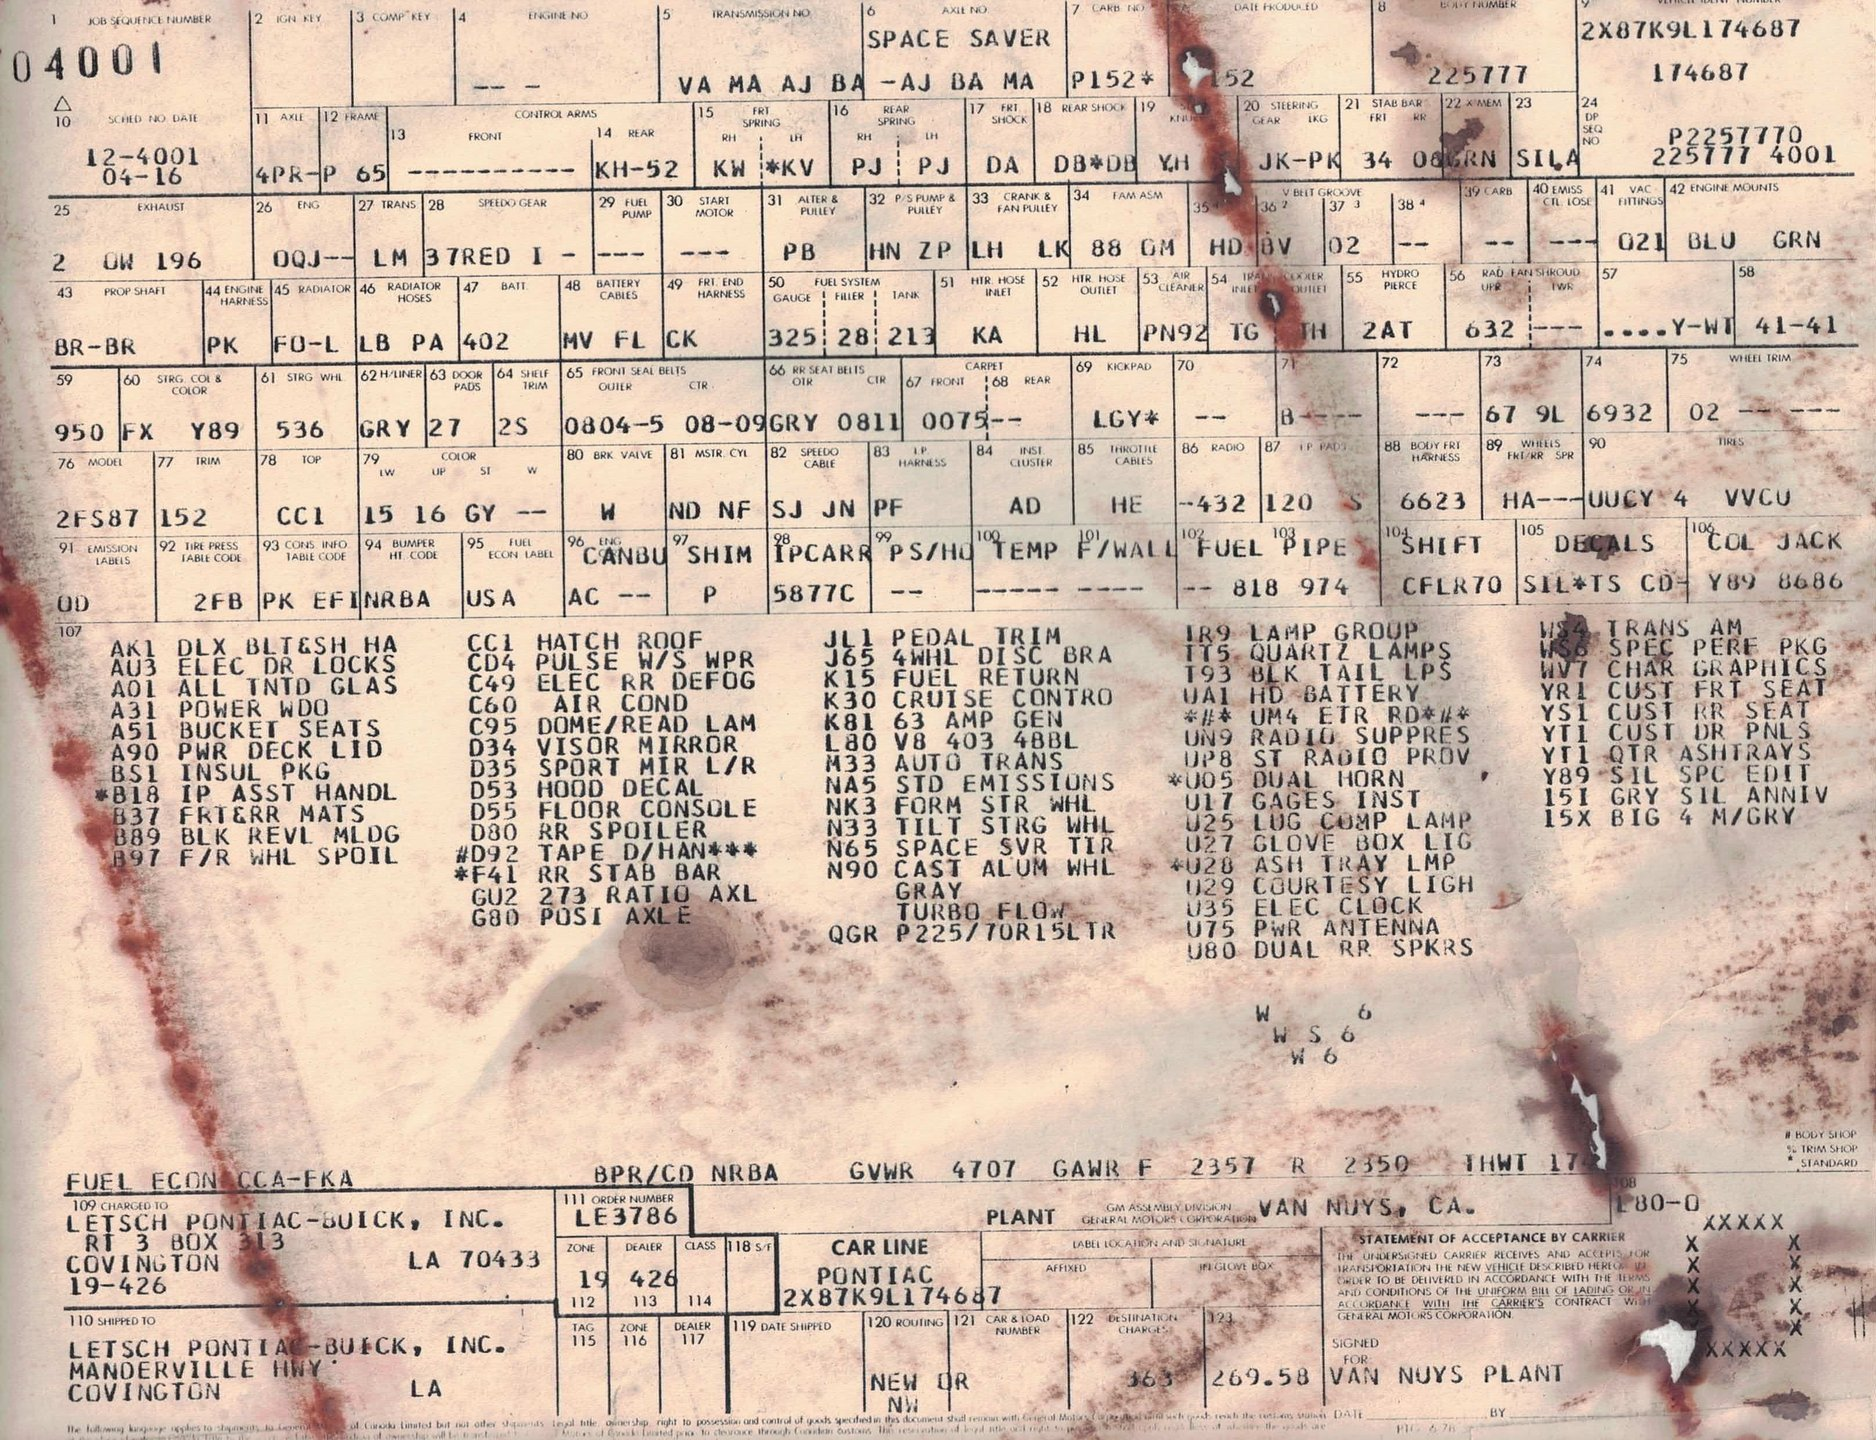 1979-pontiac-trans-am-10th-anniversary (87).jpeg